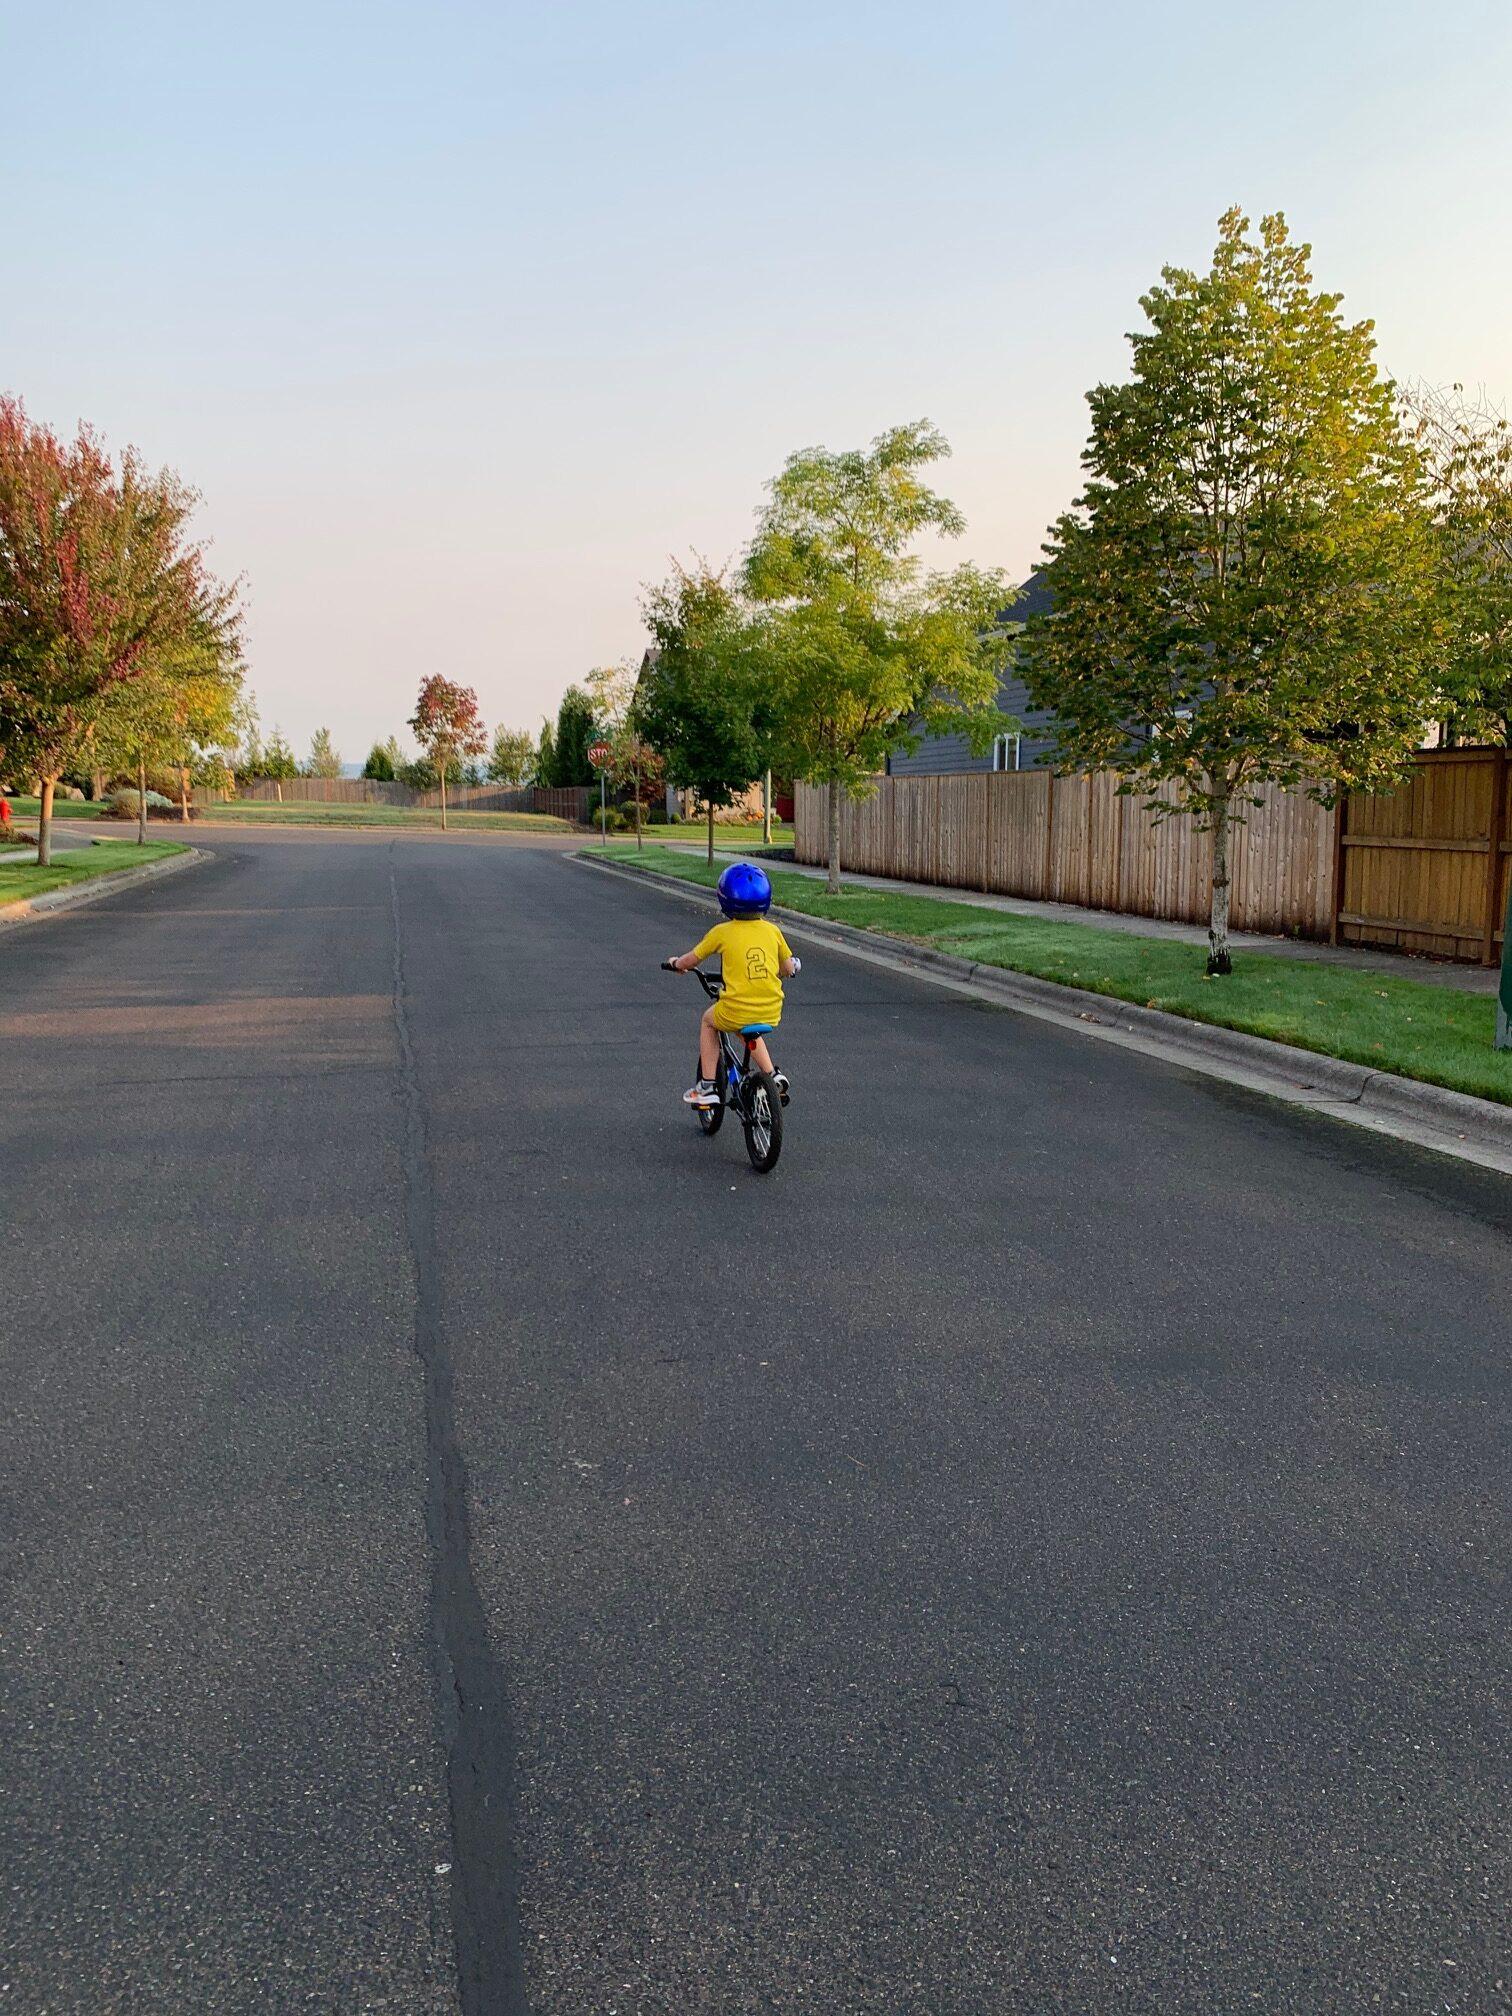 boy riding bike on road